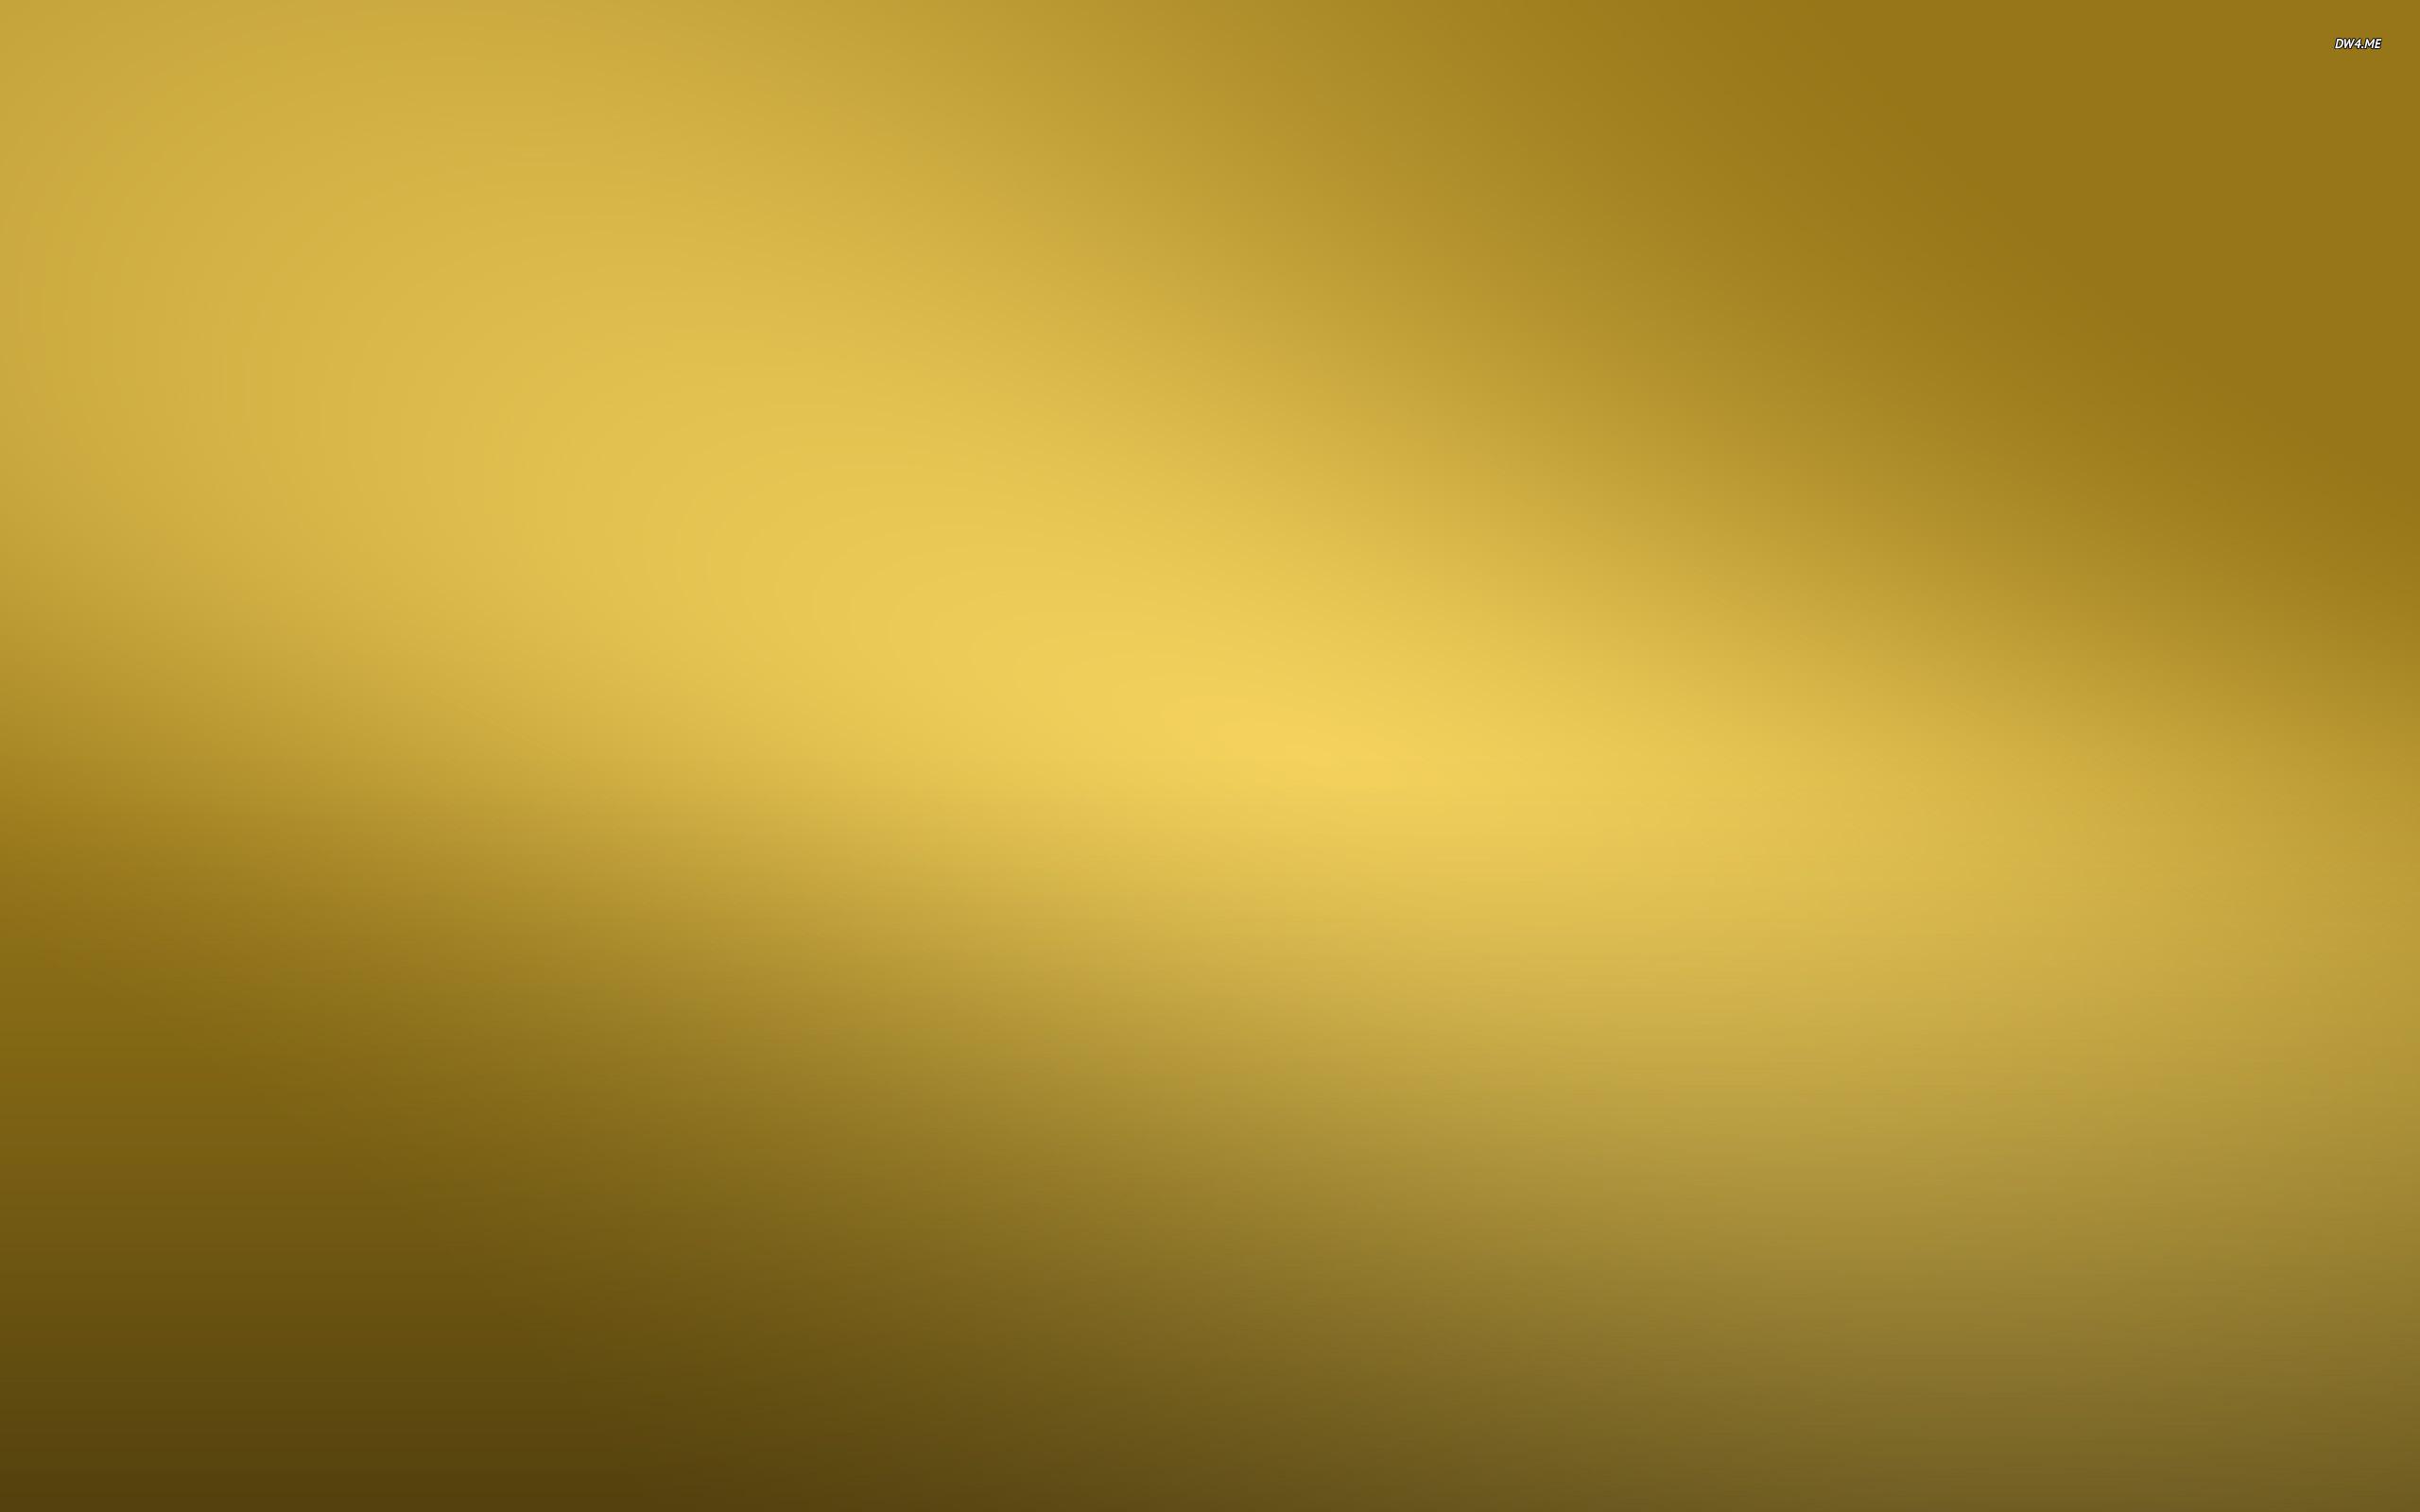 Metallic Gold Background Gold wallpaper